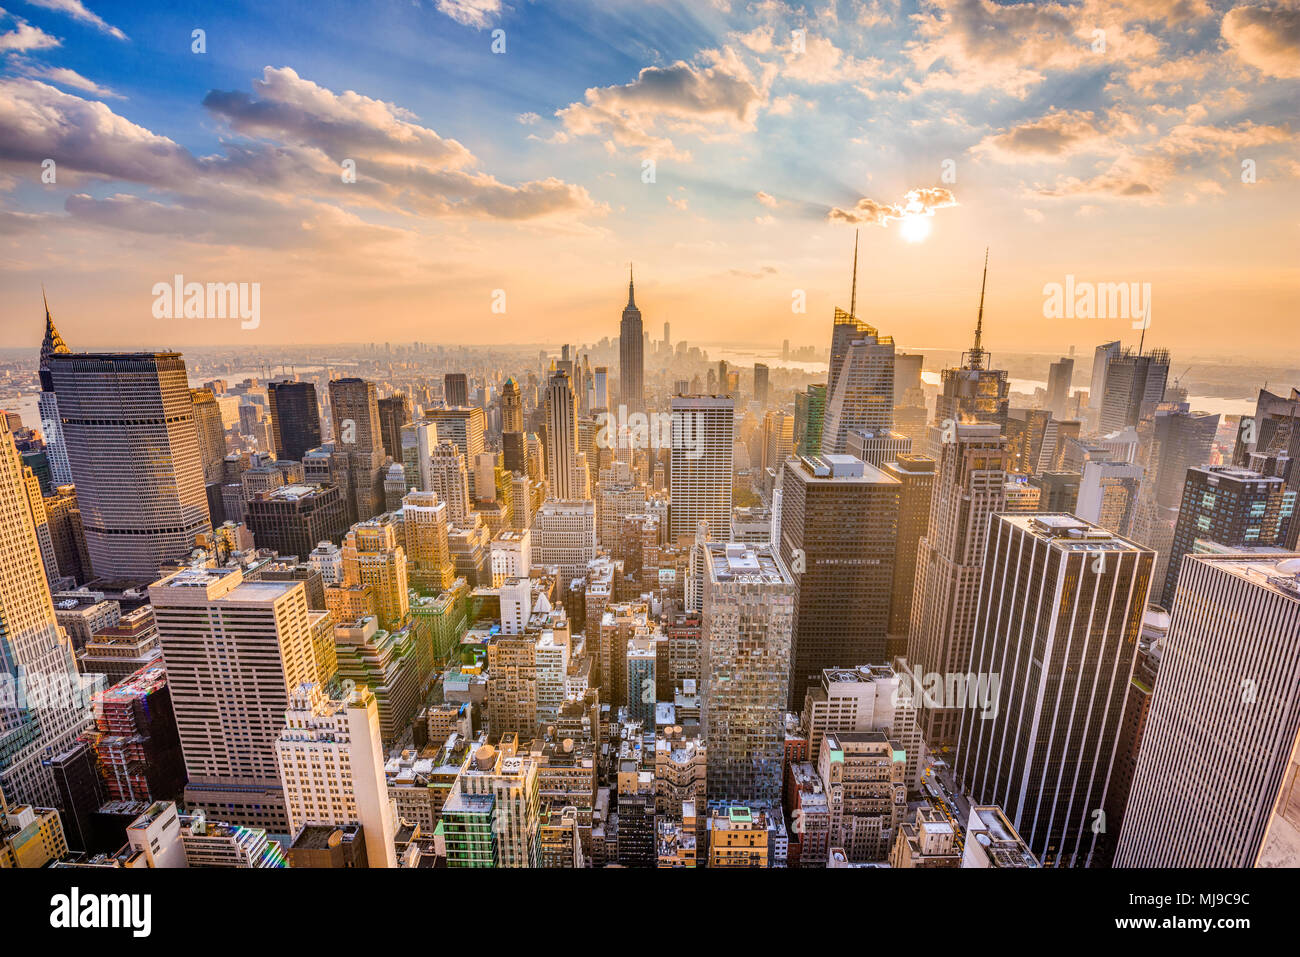 New York, New York, Stati Uniti d'America midtown skyline di Manhattan. Immagini Stock